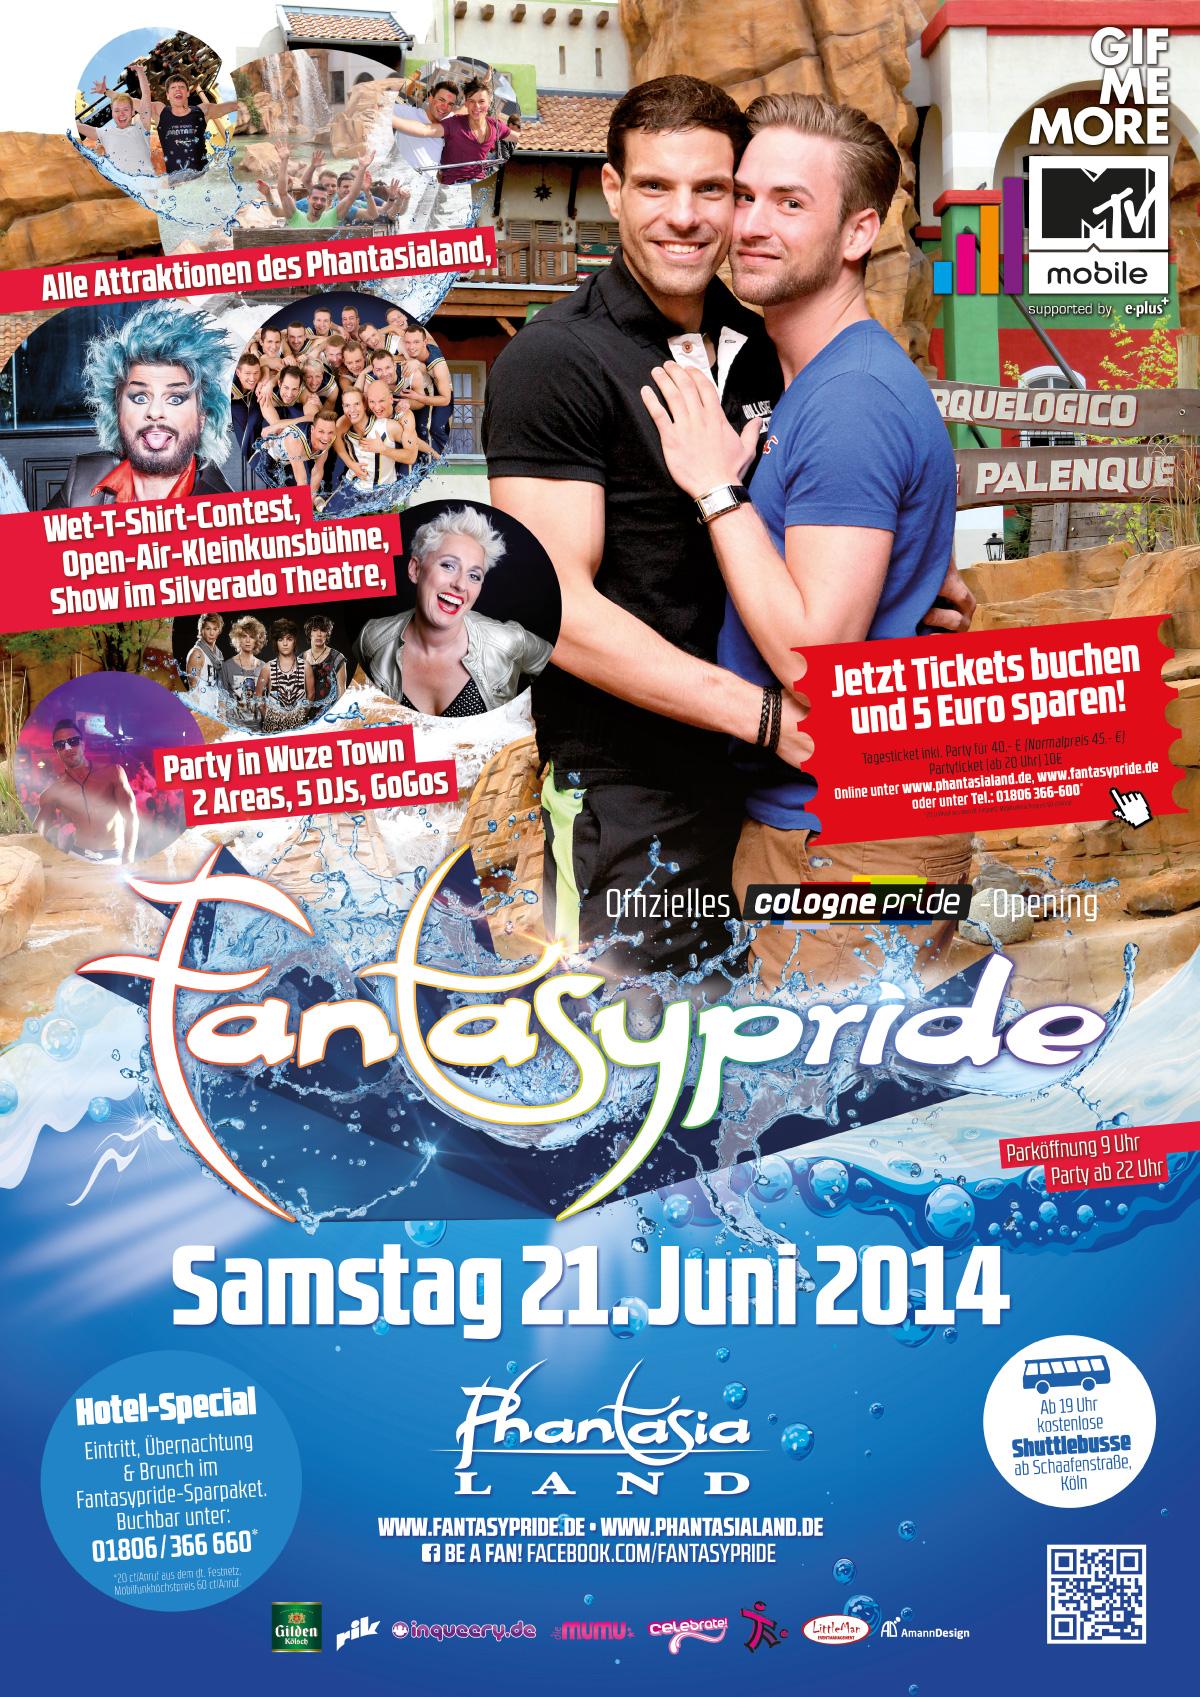 Fantasypride 2014 Plakat A2